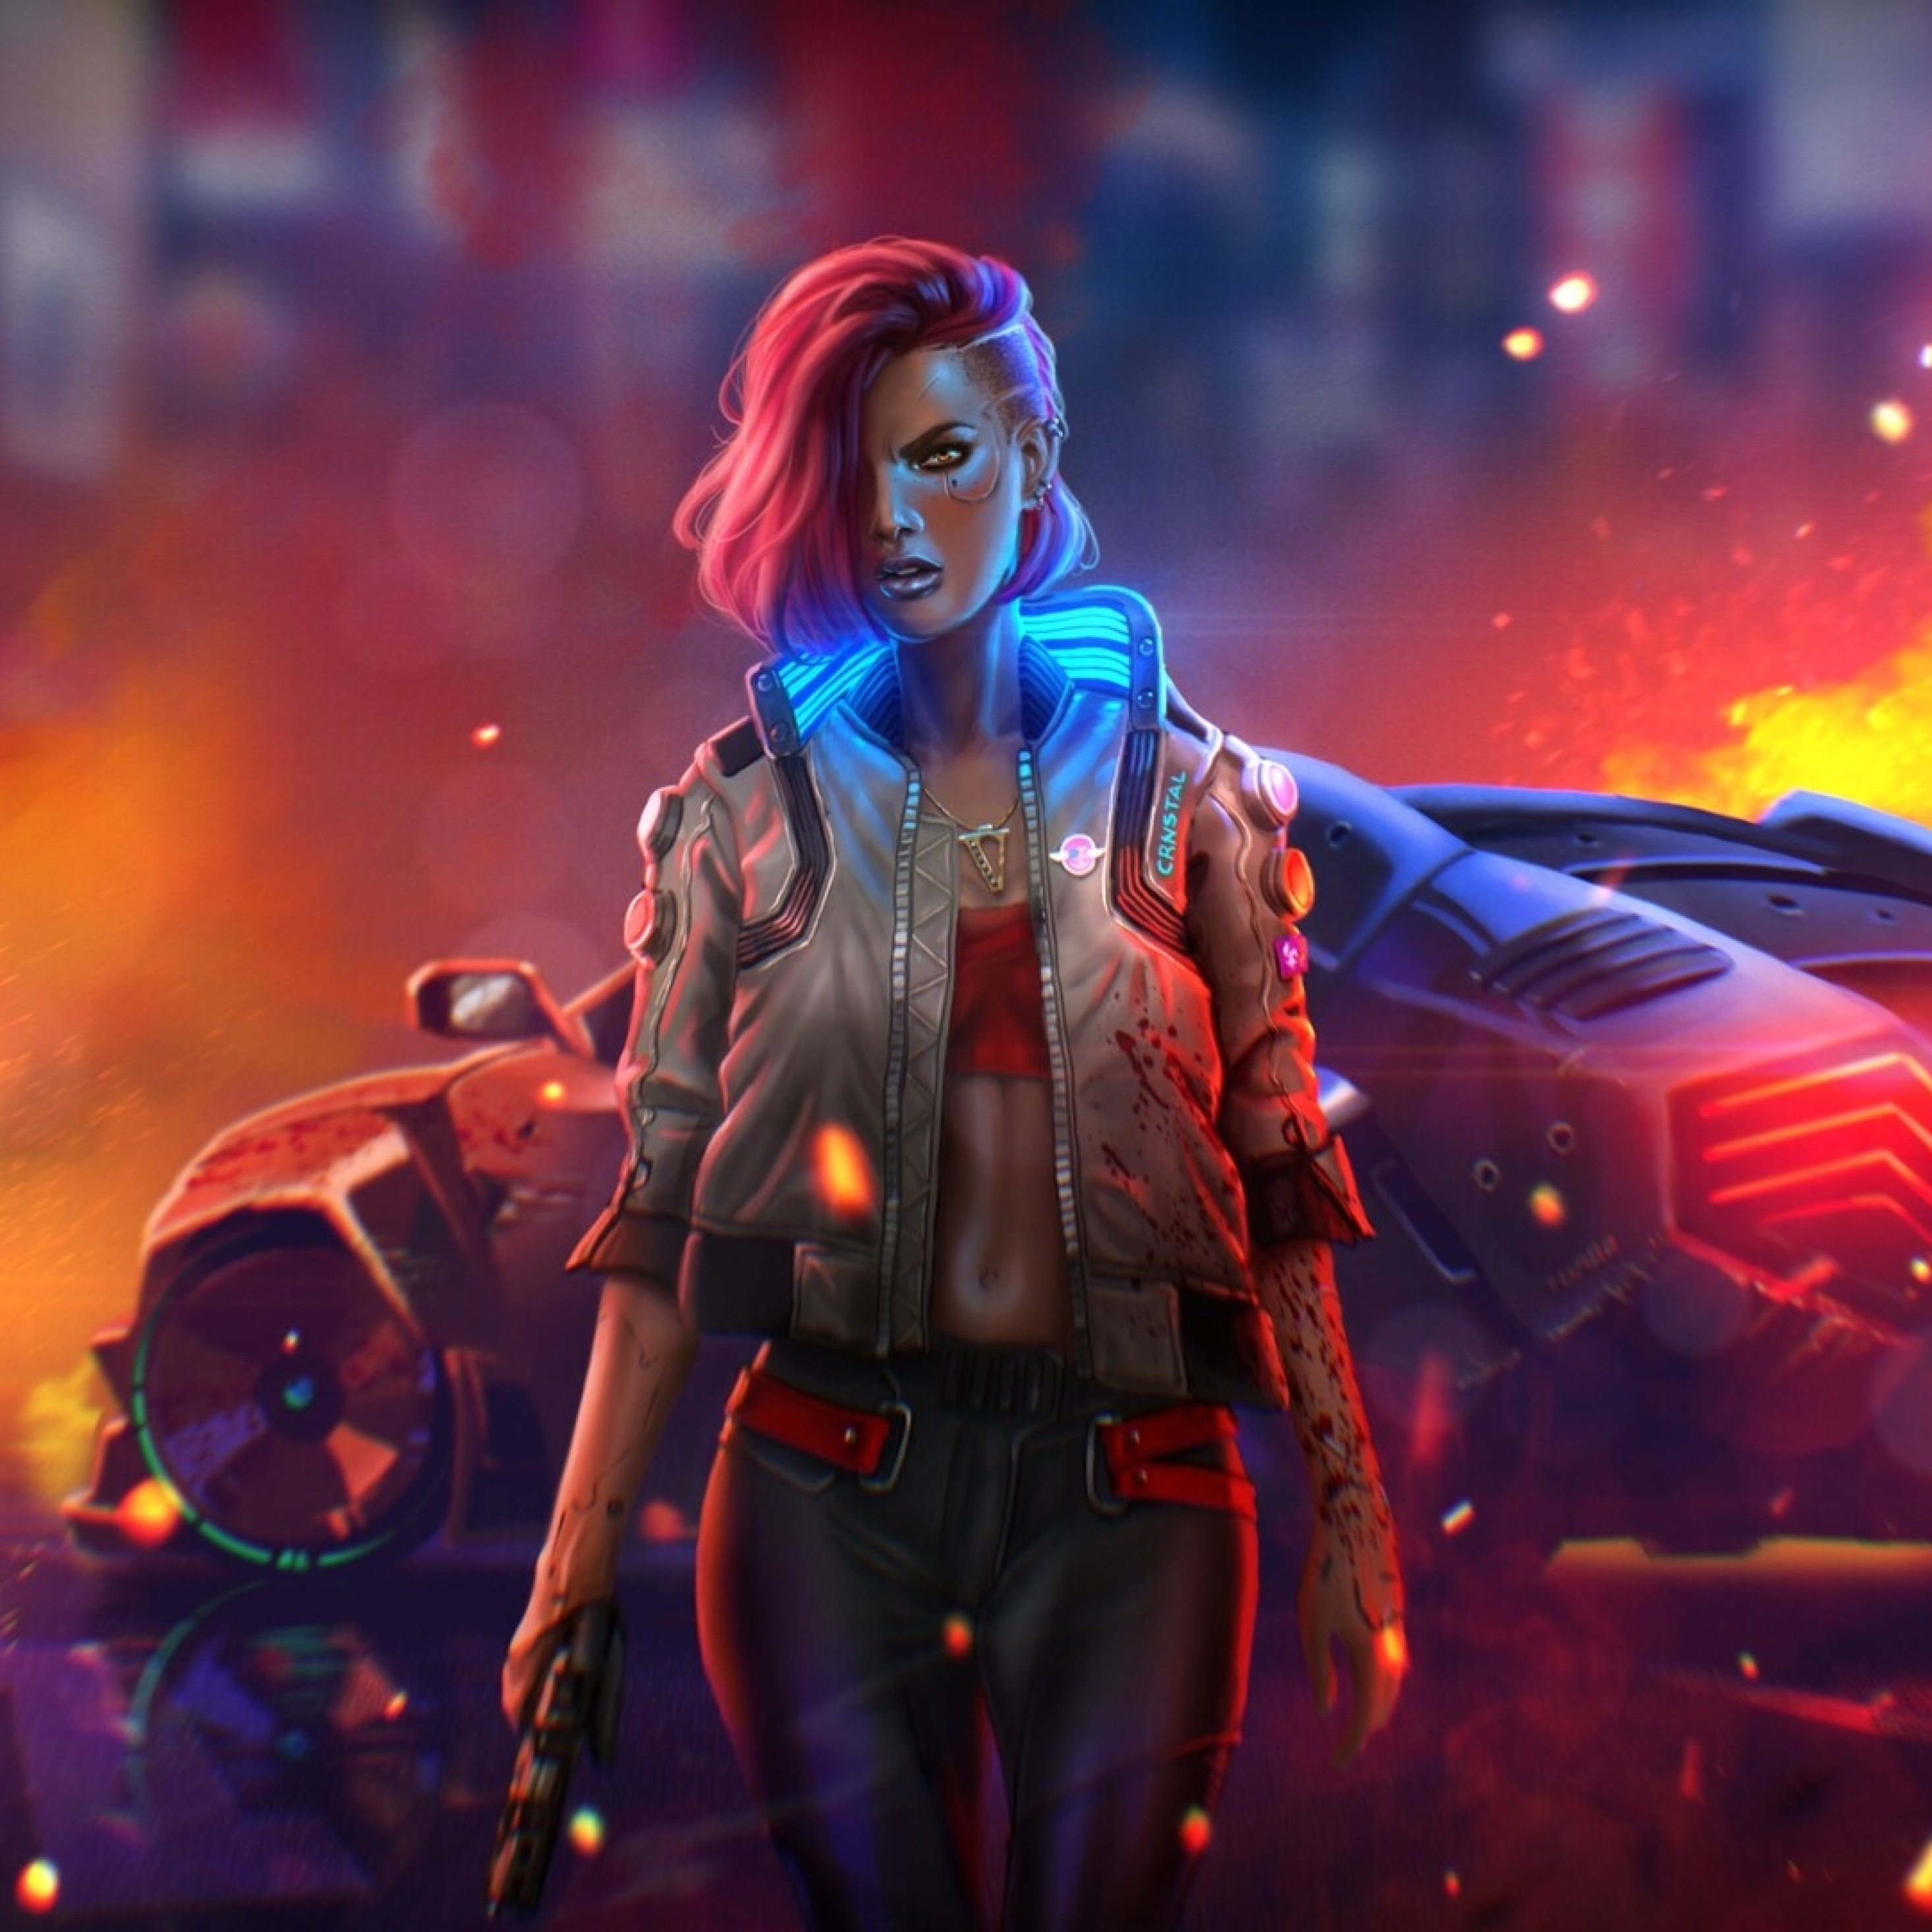 2932x2932 Cyborg Cyberpunk 2077 Digital Fan Art Ipad Pro ...